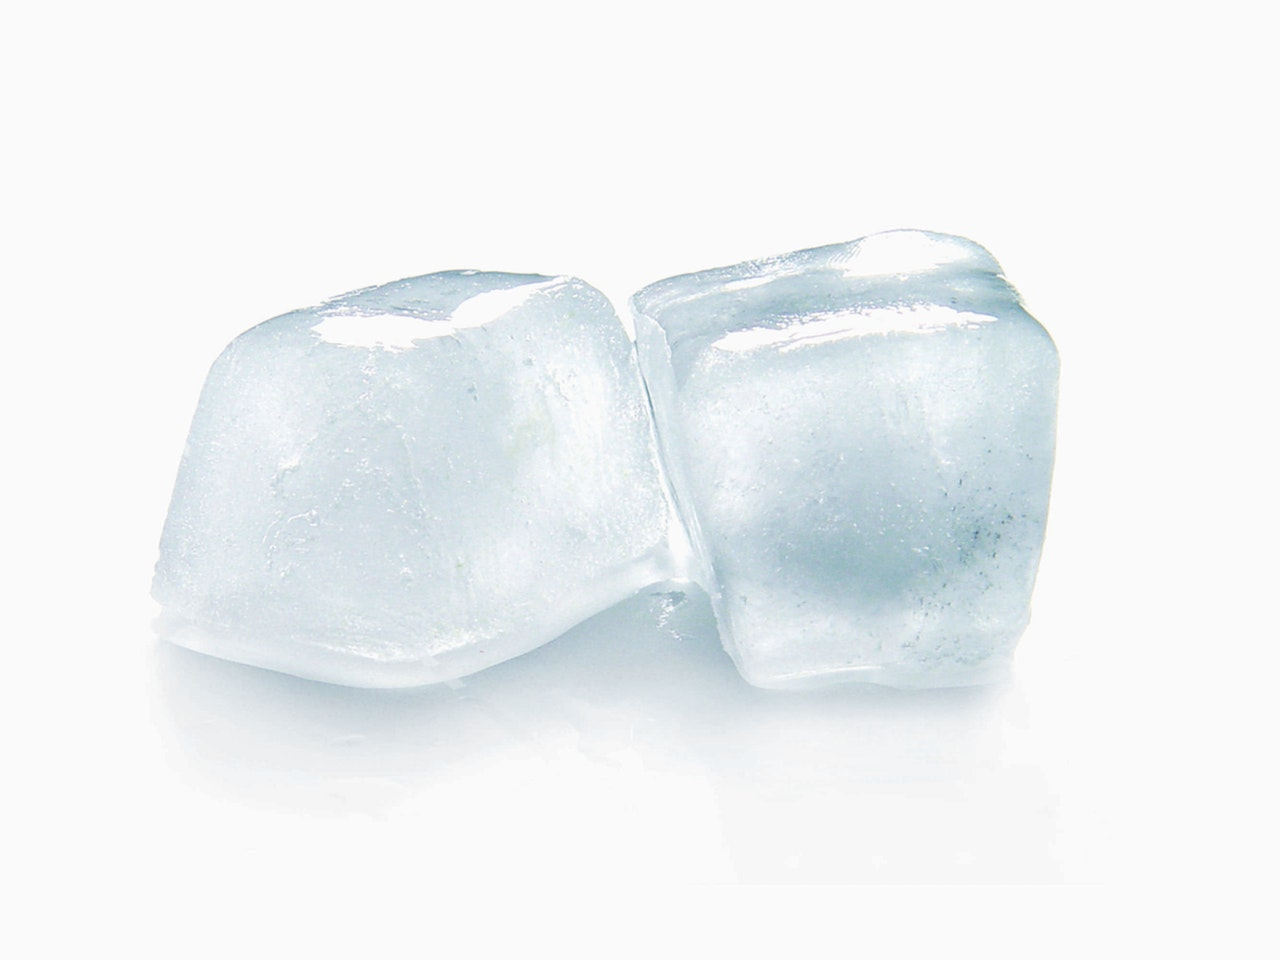 Bary a práca s ľadom.